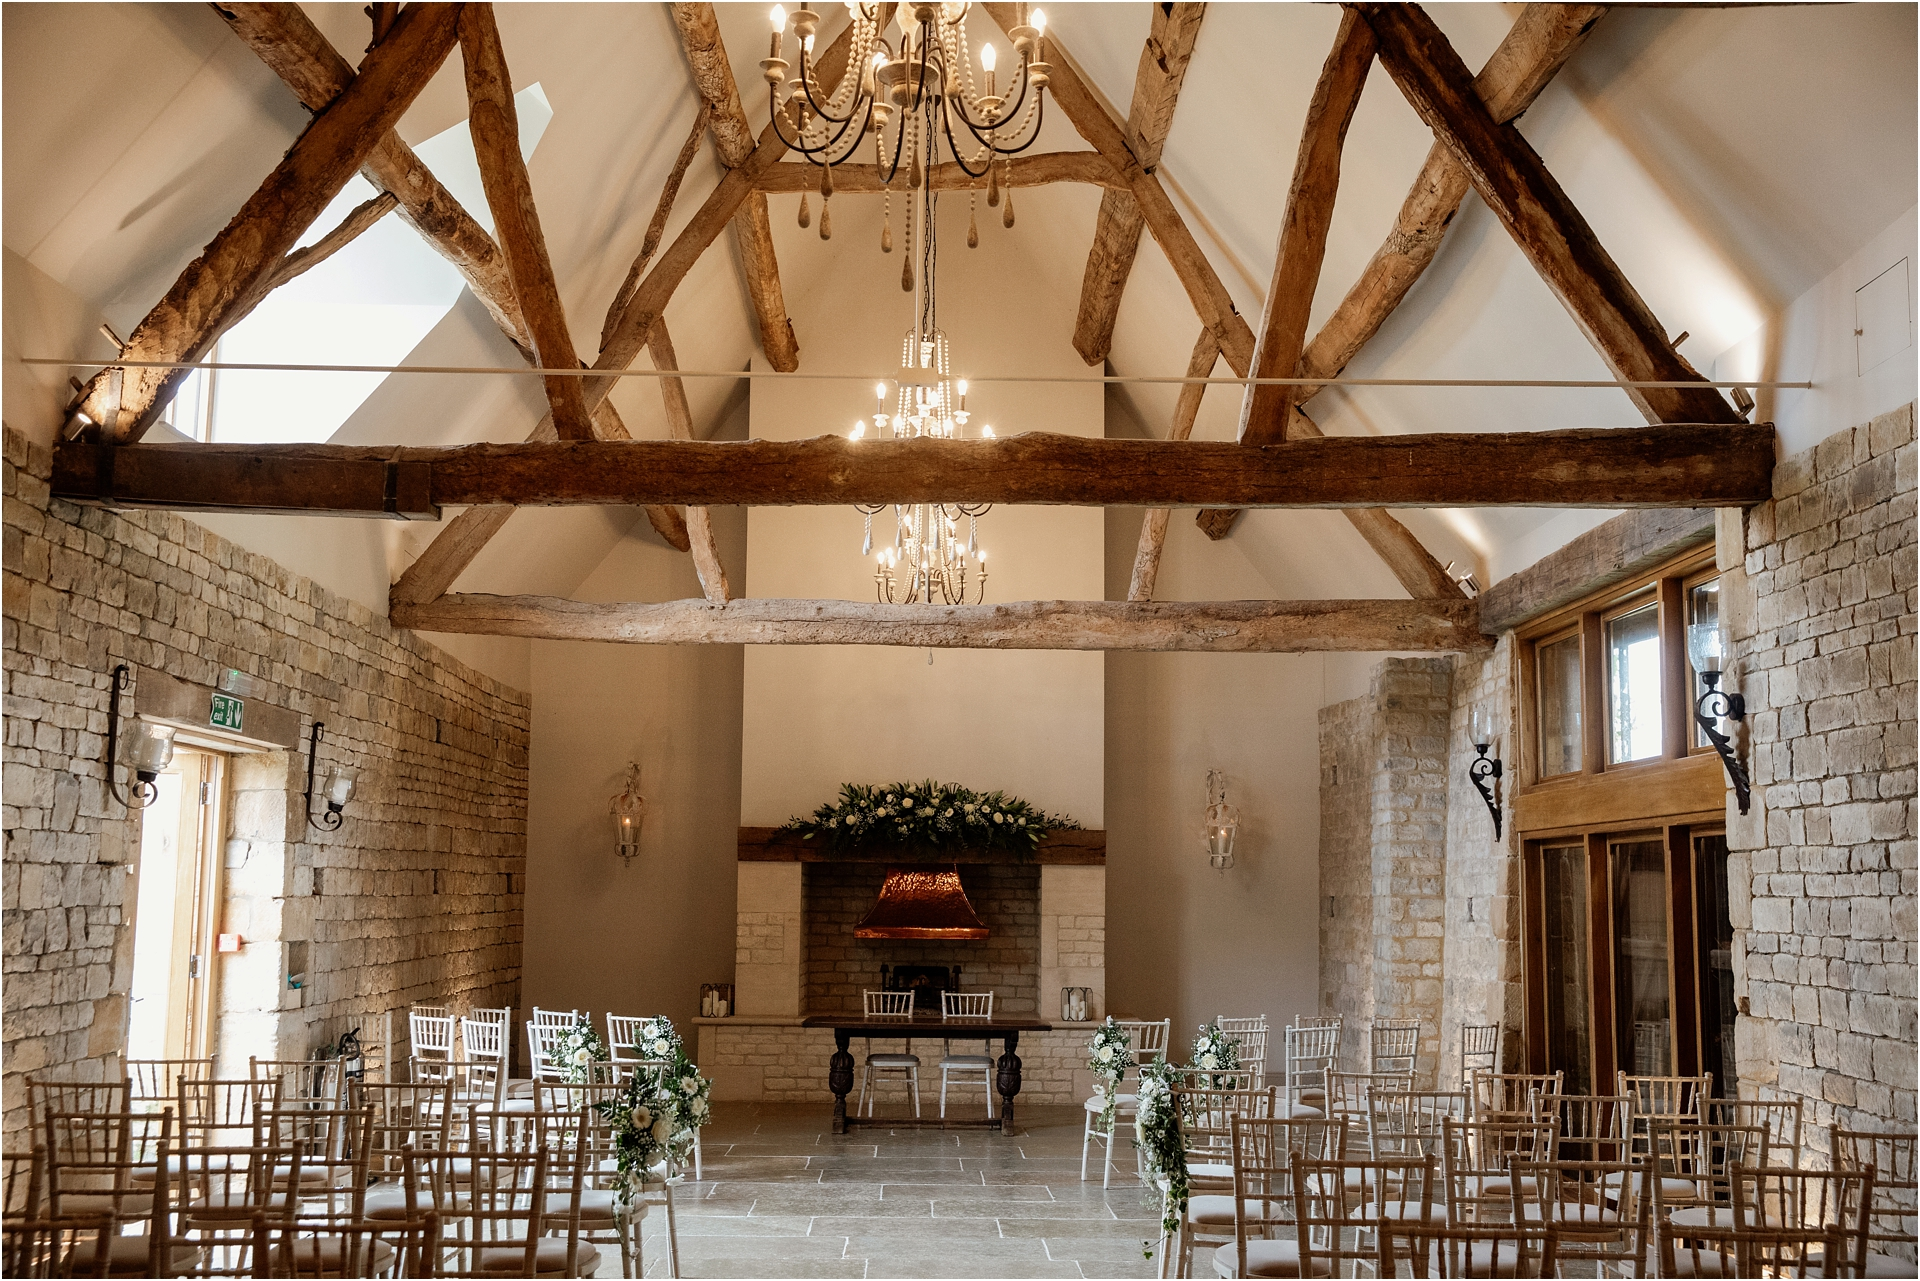 Blackwell Grange Cotswolds wedding venue